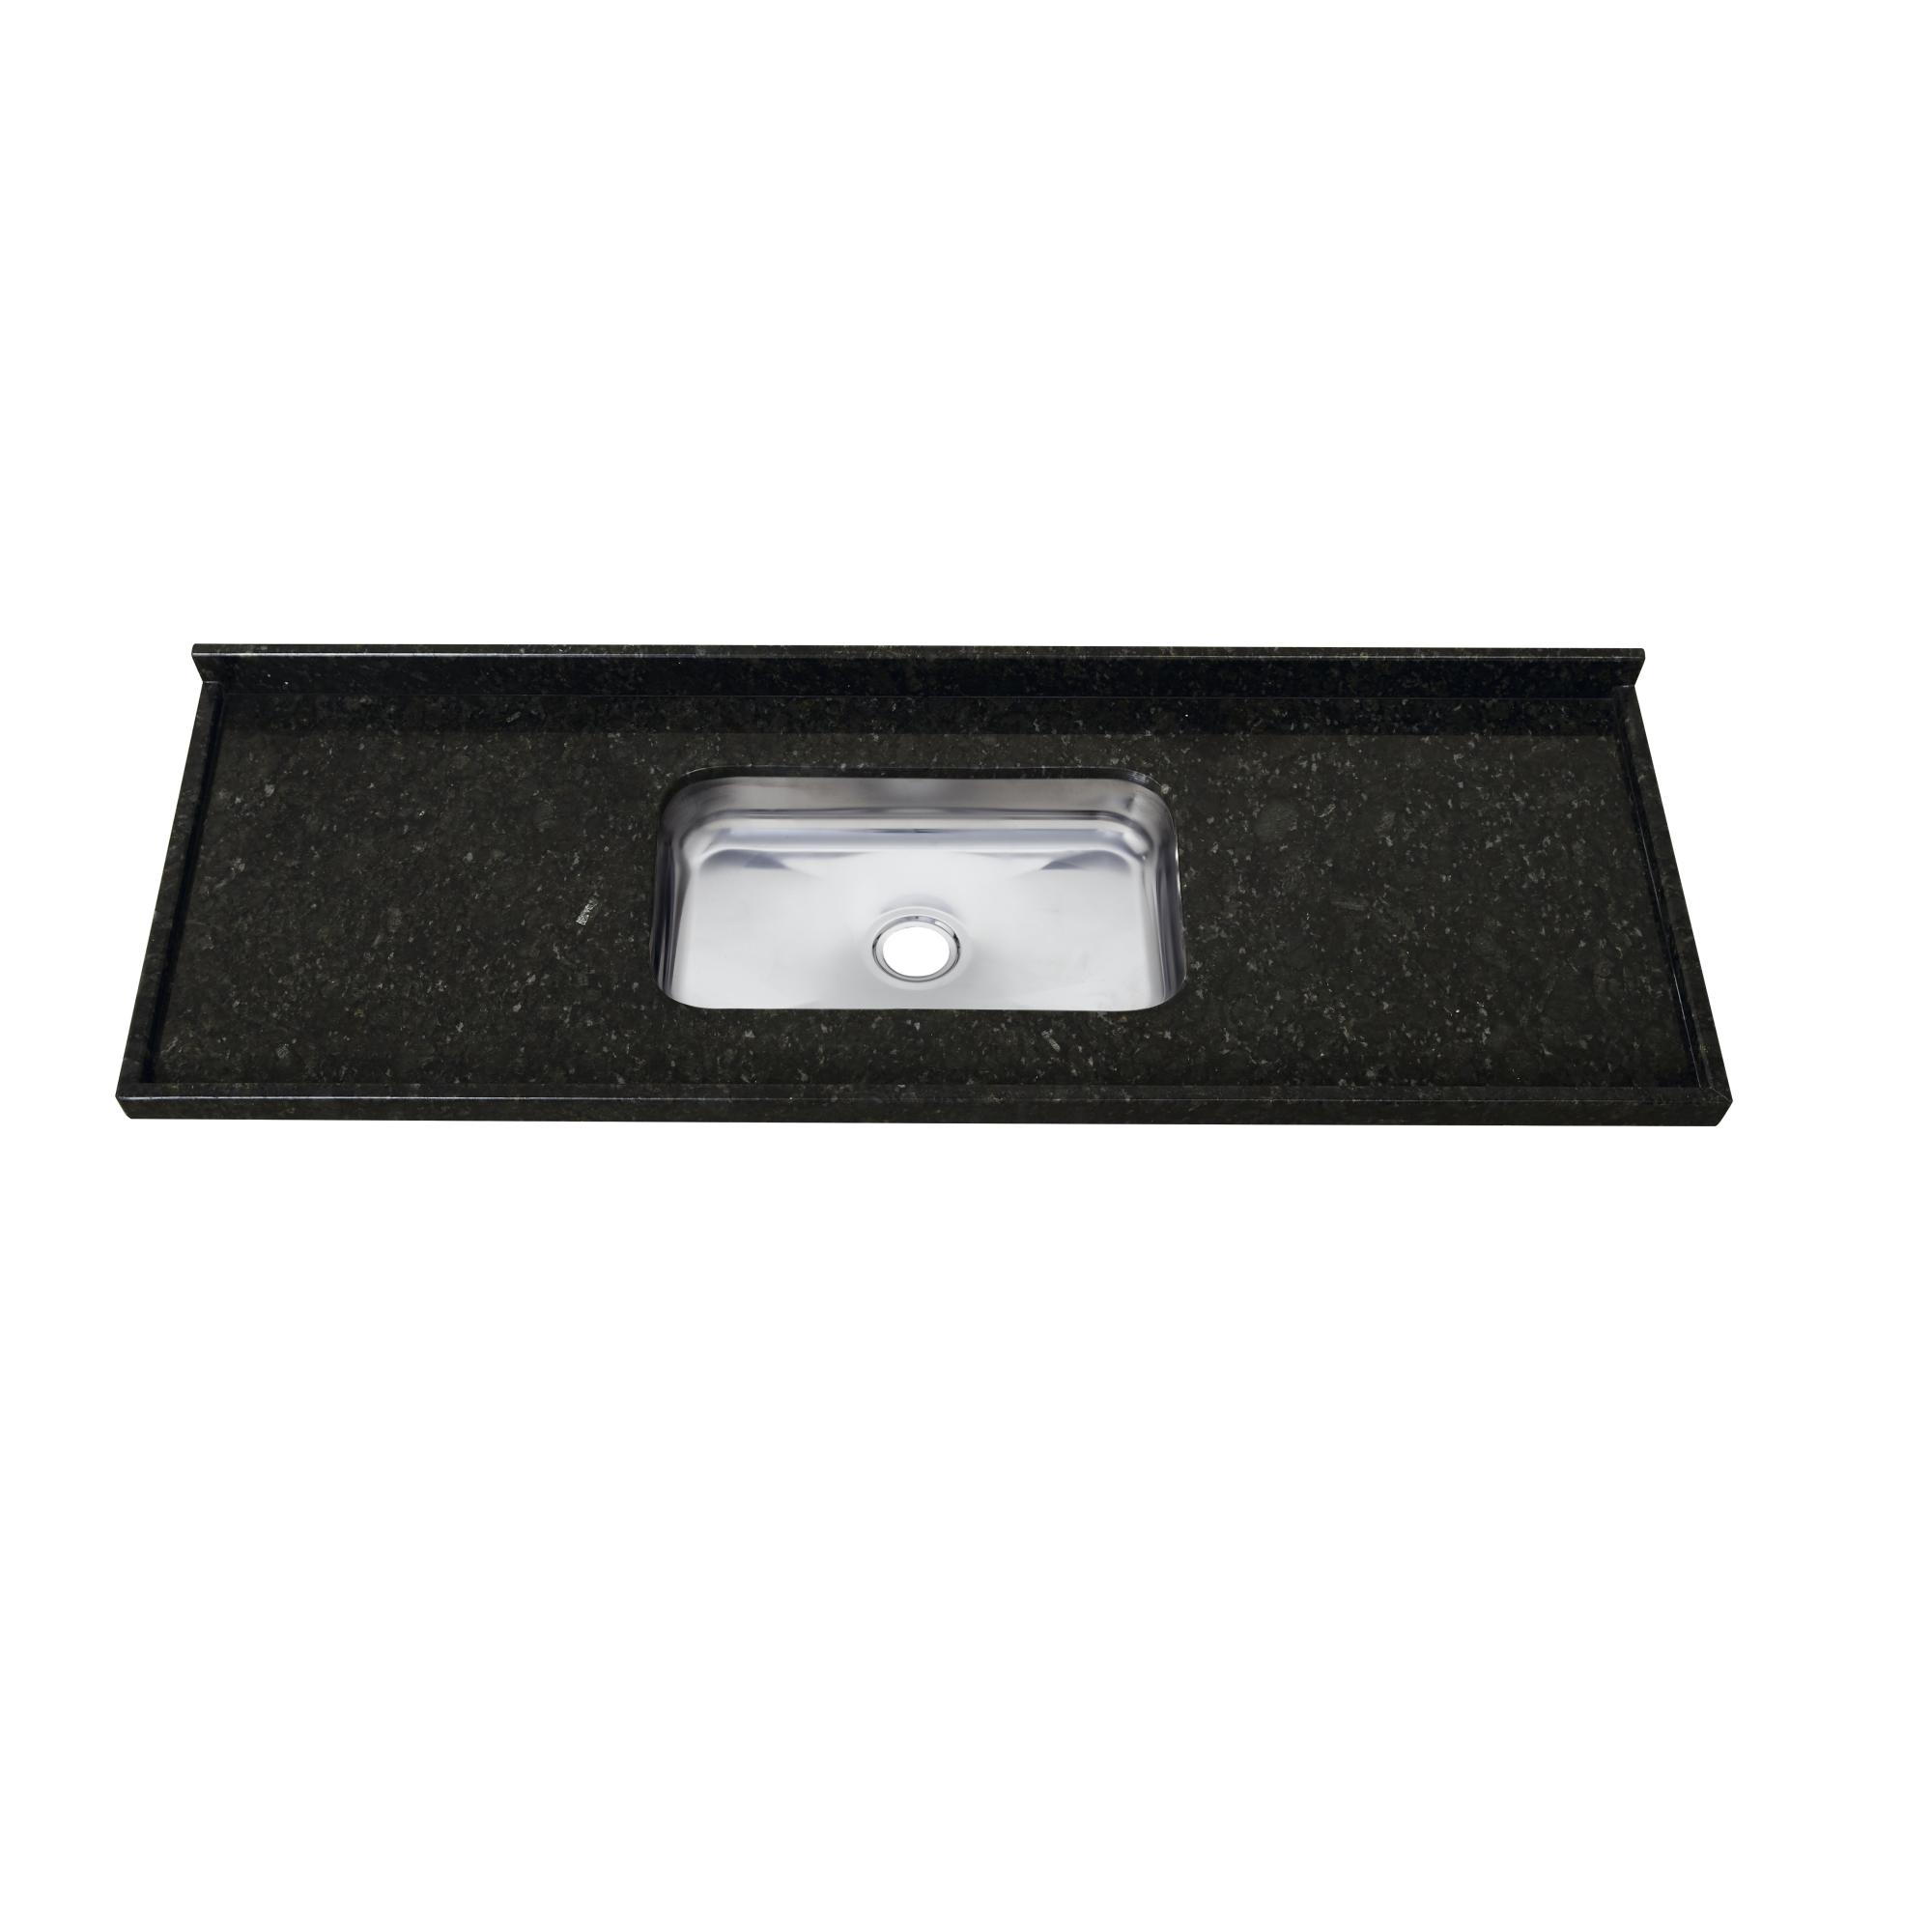 Pia Simples para Cozinha de Granito Brilho 150cm x 55cm Verde Escuro - 50111226 - Pop Venturini